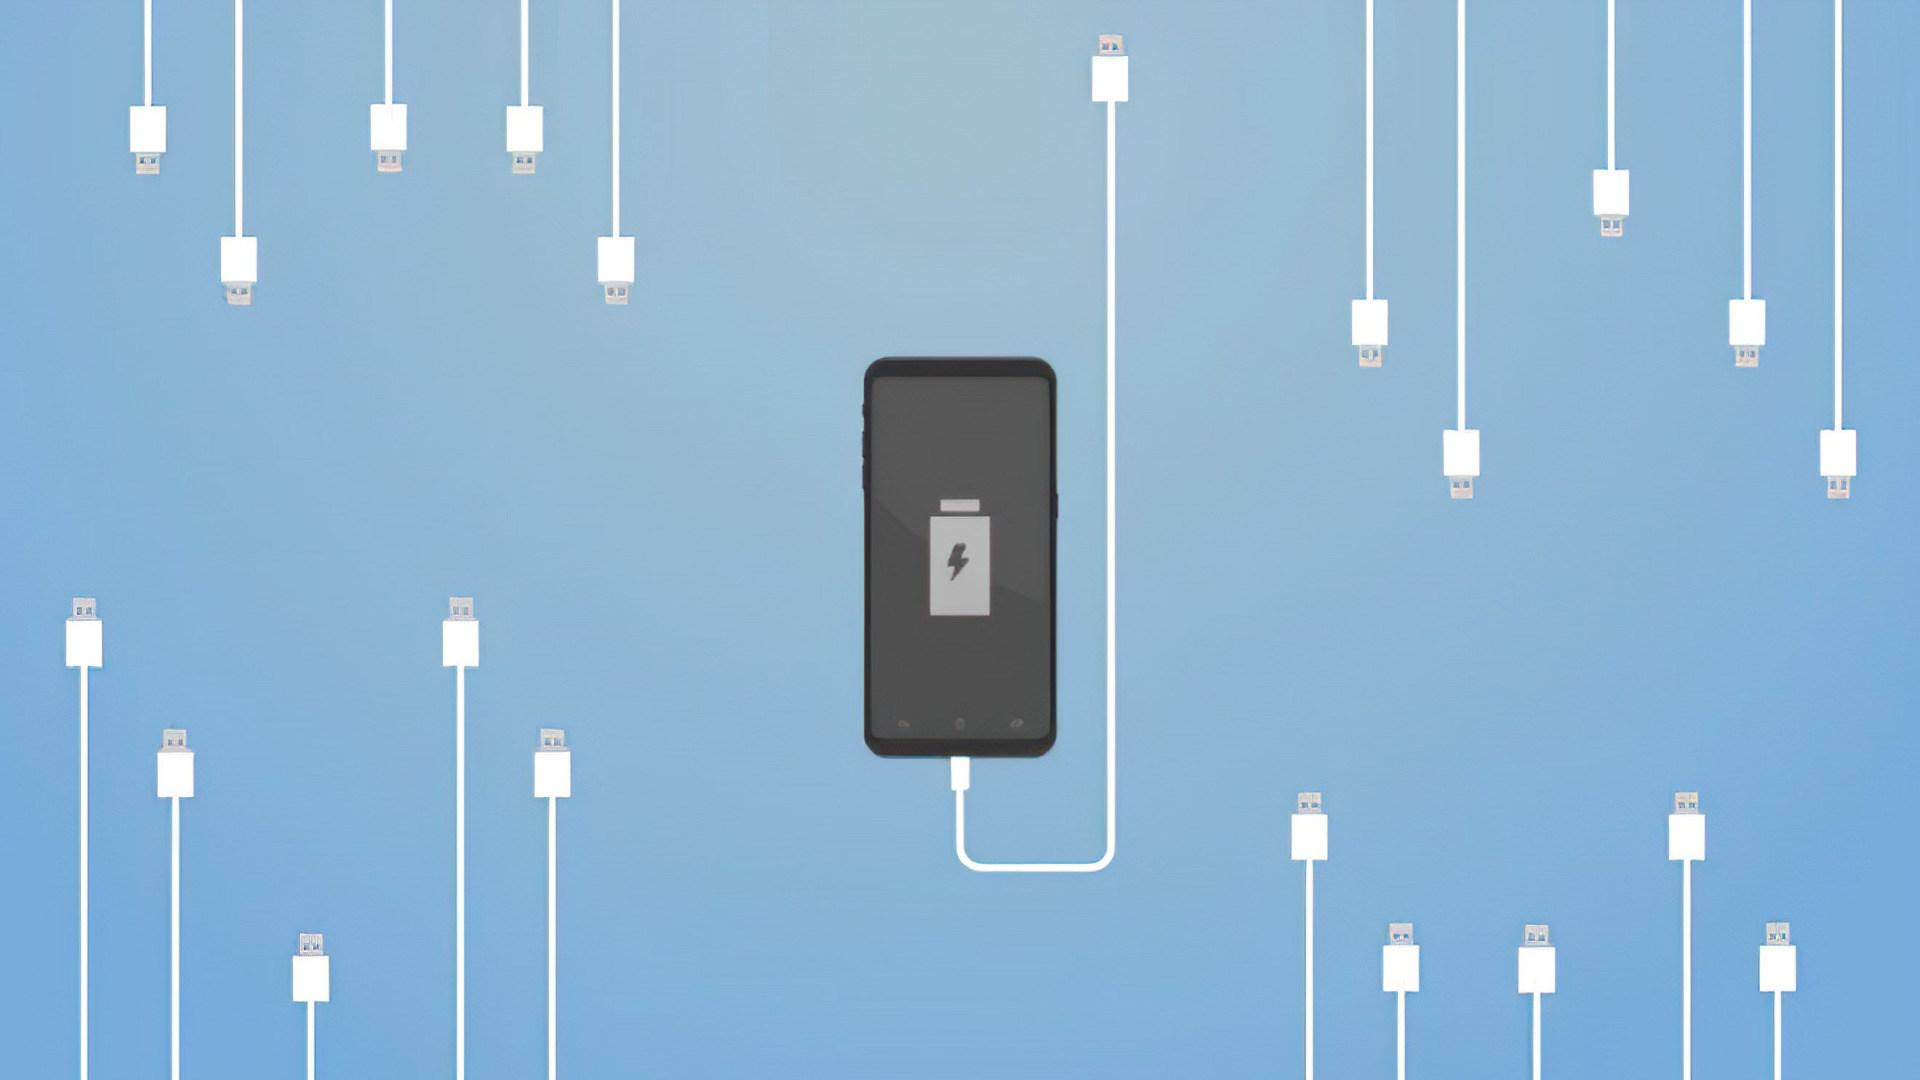 Akku, Batterie, Strom, Kabel, Datenübertragung, Usb, USB Type-C, USB-C, Anschluss, Ladegerät, Hdmi, MicroSD, SD-Karte, Datentransfer, Adapter, Thunderbolt, Quick Charge, Ethernet, USB 3.0, Port, USB 3.1, Anschlüsse, stecker, SD-Karten, Lightning, USB Type C, Thunderbolt 3, Akkupack, USB C, USB Typ-C, Usb Stick, SuperCharge, USB Typ C, Powerbank, Usb Sticks, Handy laden, USB Hub, Smartphone to PC, Steckeradapter, iPhone Kabel, iPhone Stecker, USB 3, Batteriepack, QuickCharge, BatteryBar, Akku laden, Charge